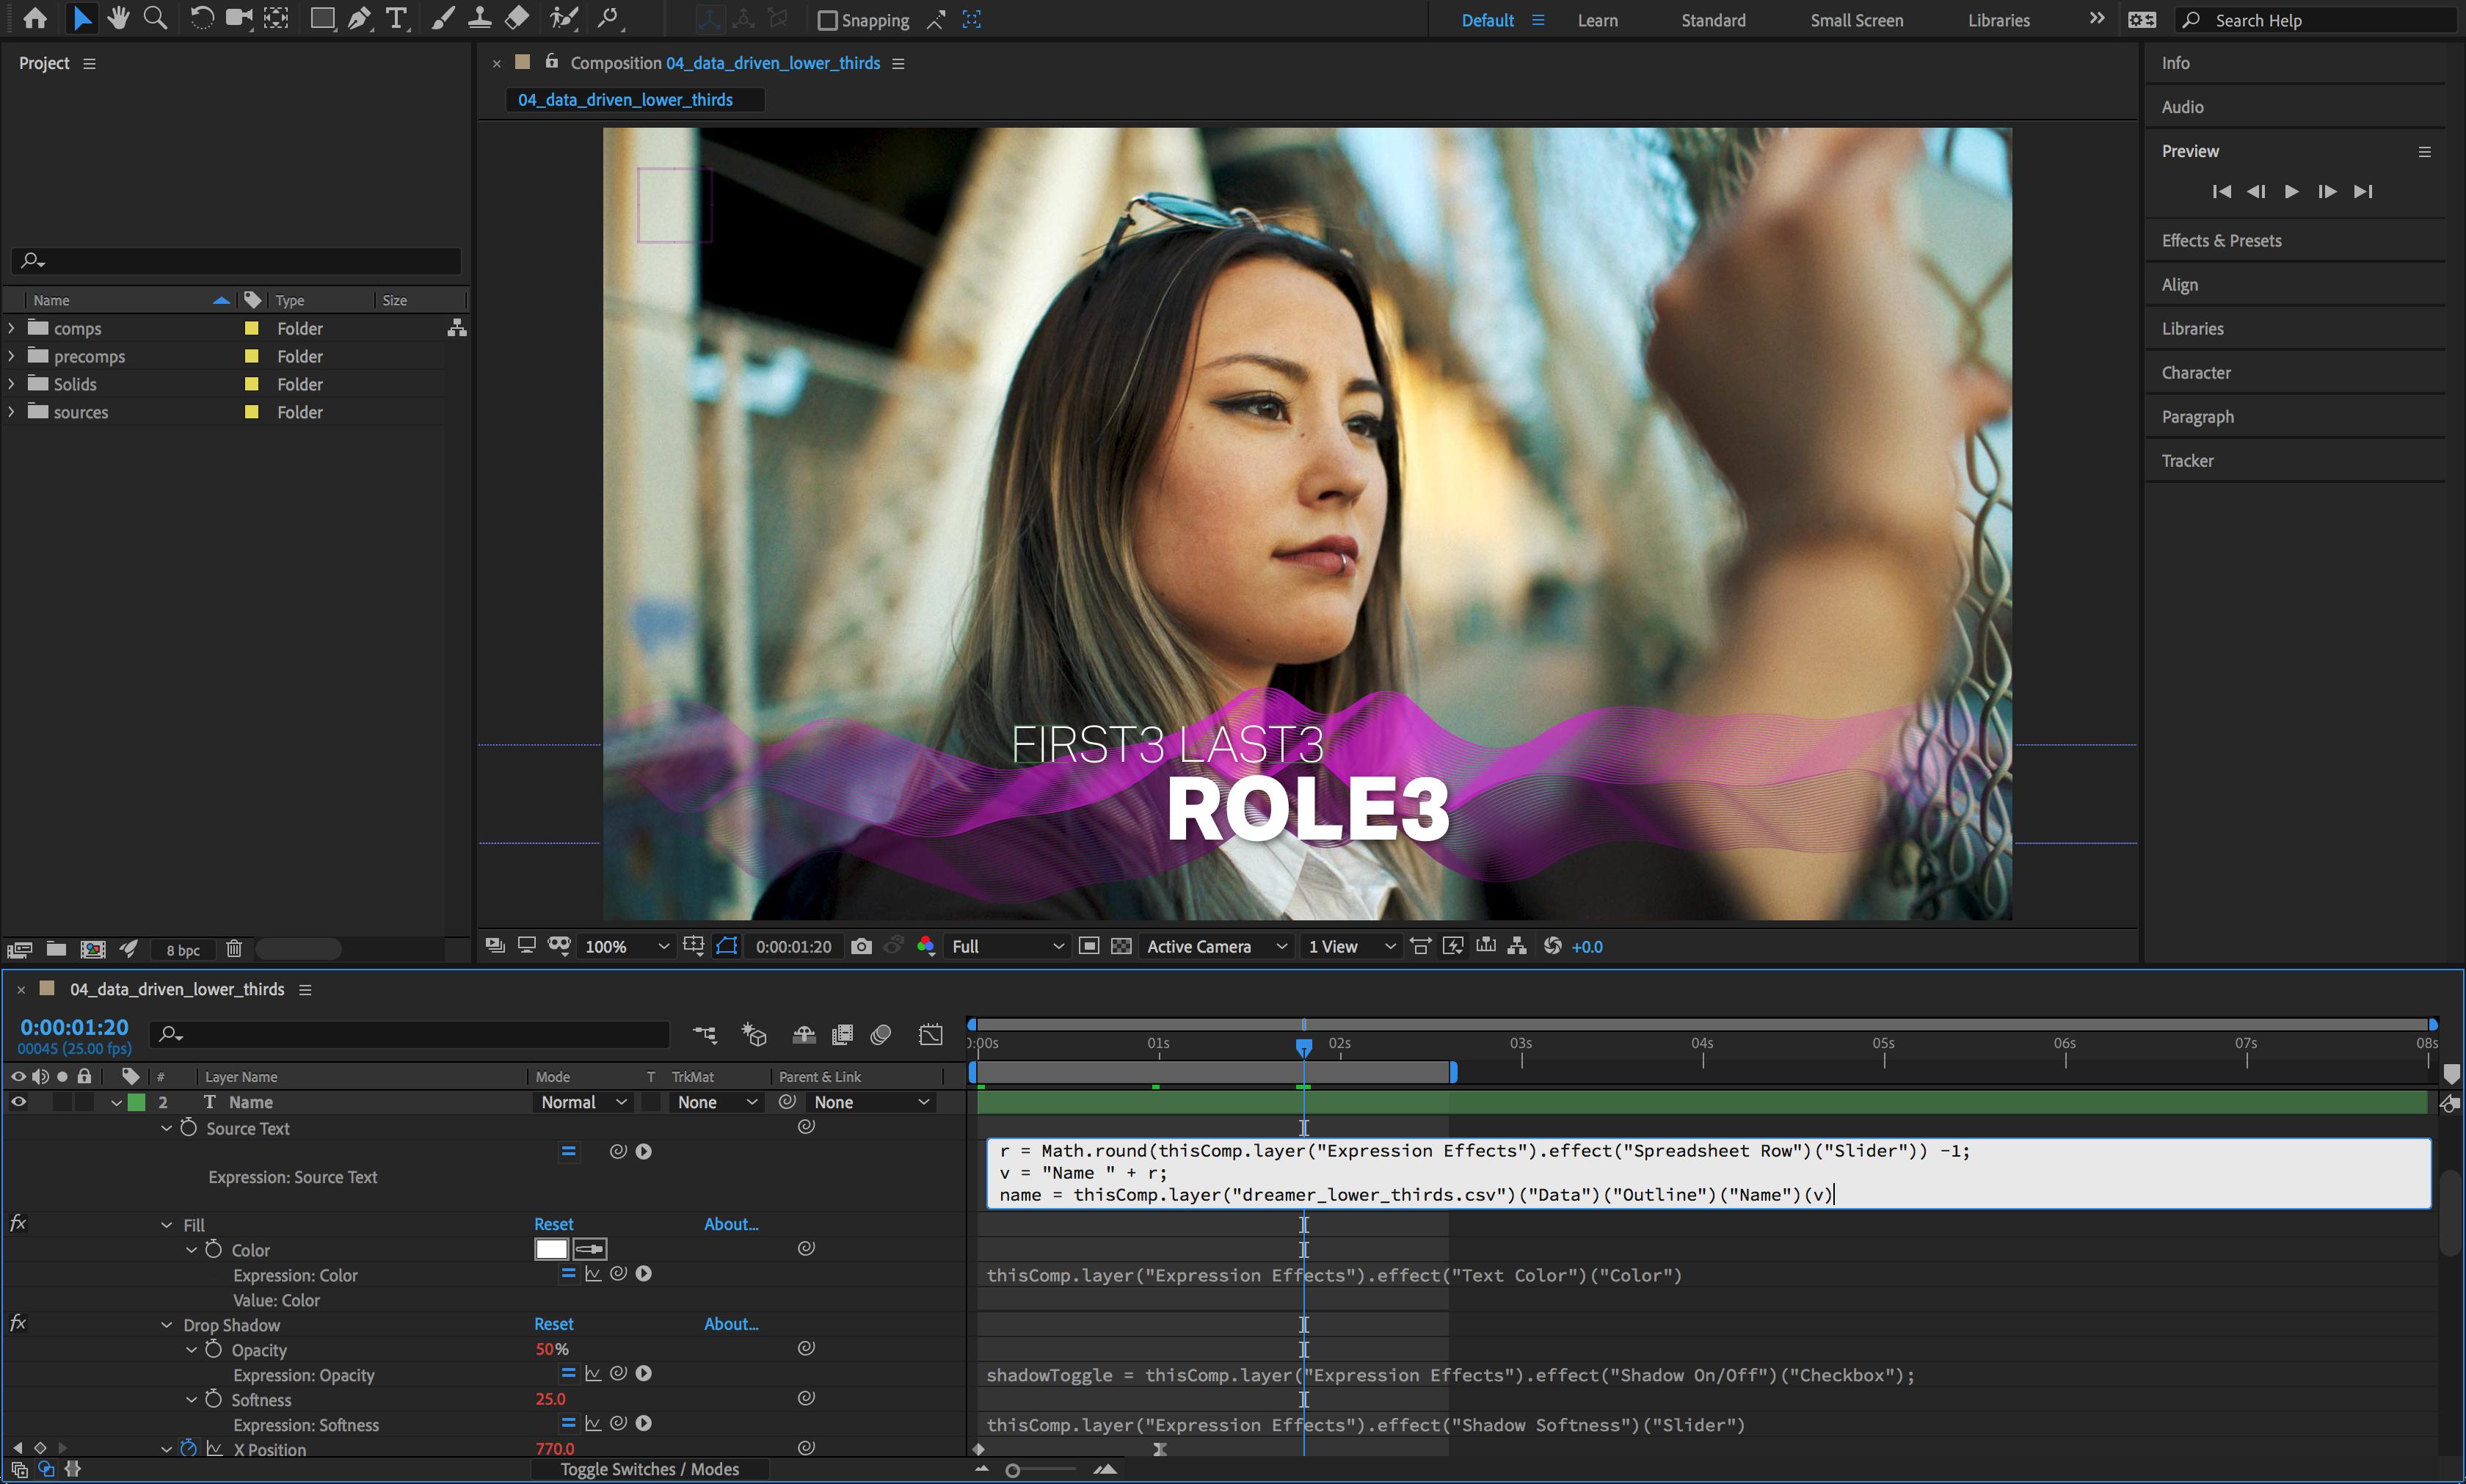 Adobeが2018年後半のビデオ関連製品バージョンアップ予定を公開~VTuberやVRなど新たなコンテンツ制作に対応する機能拡張